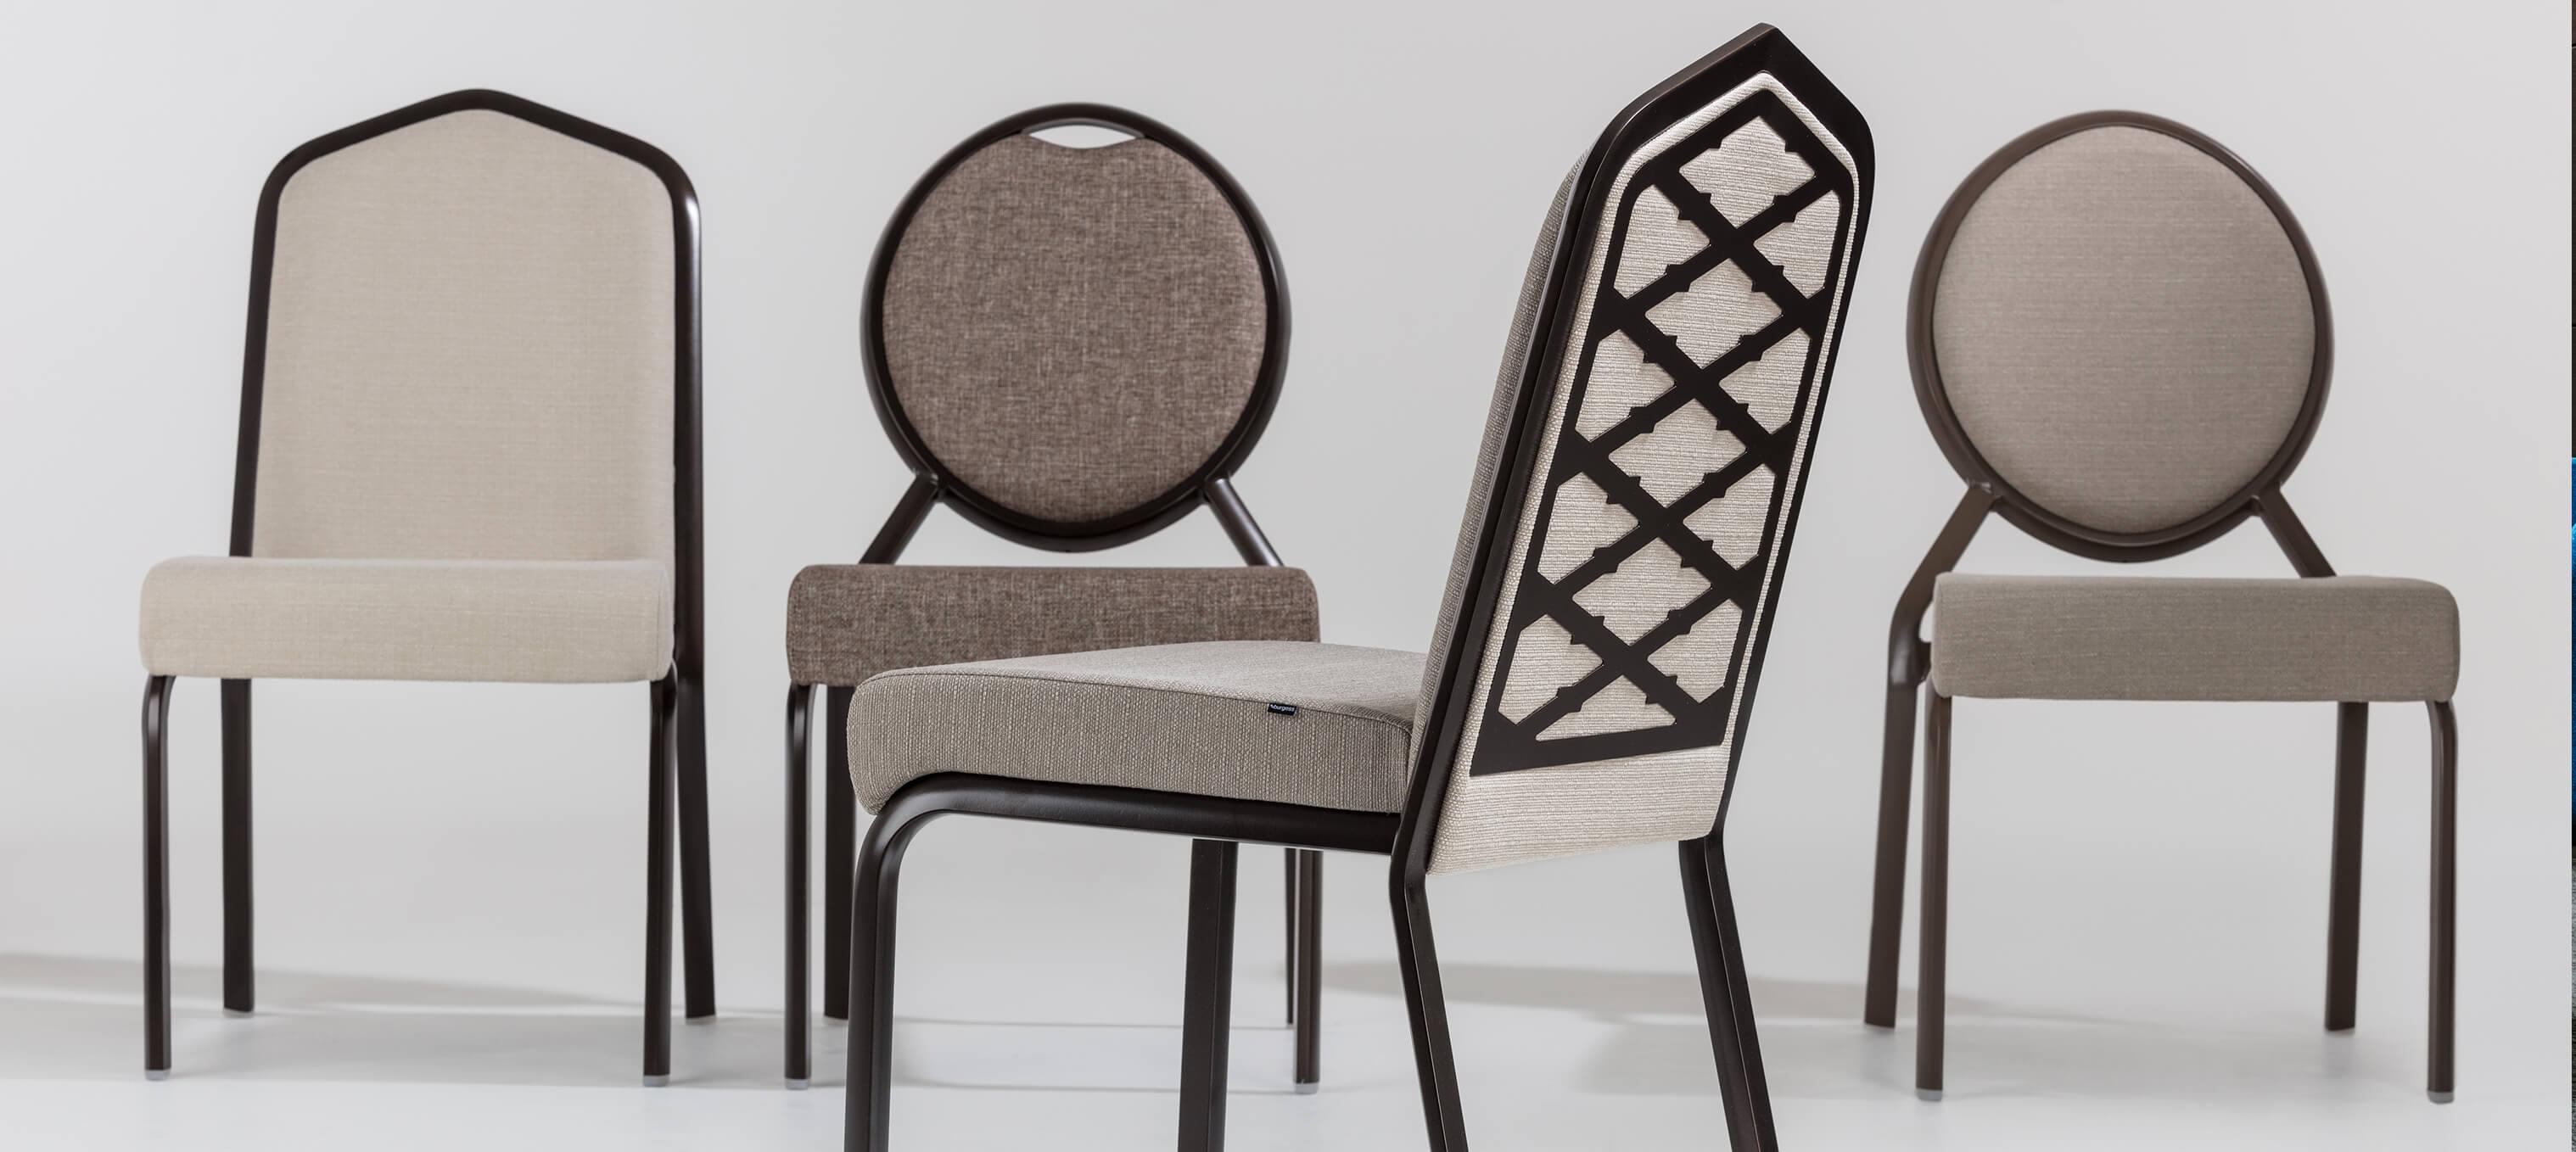 Simbia Hotel Luxury Chair Burgess